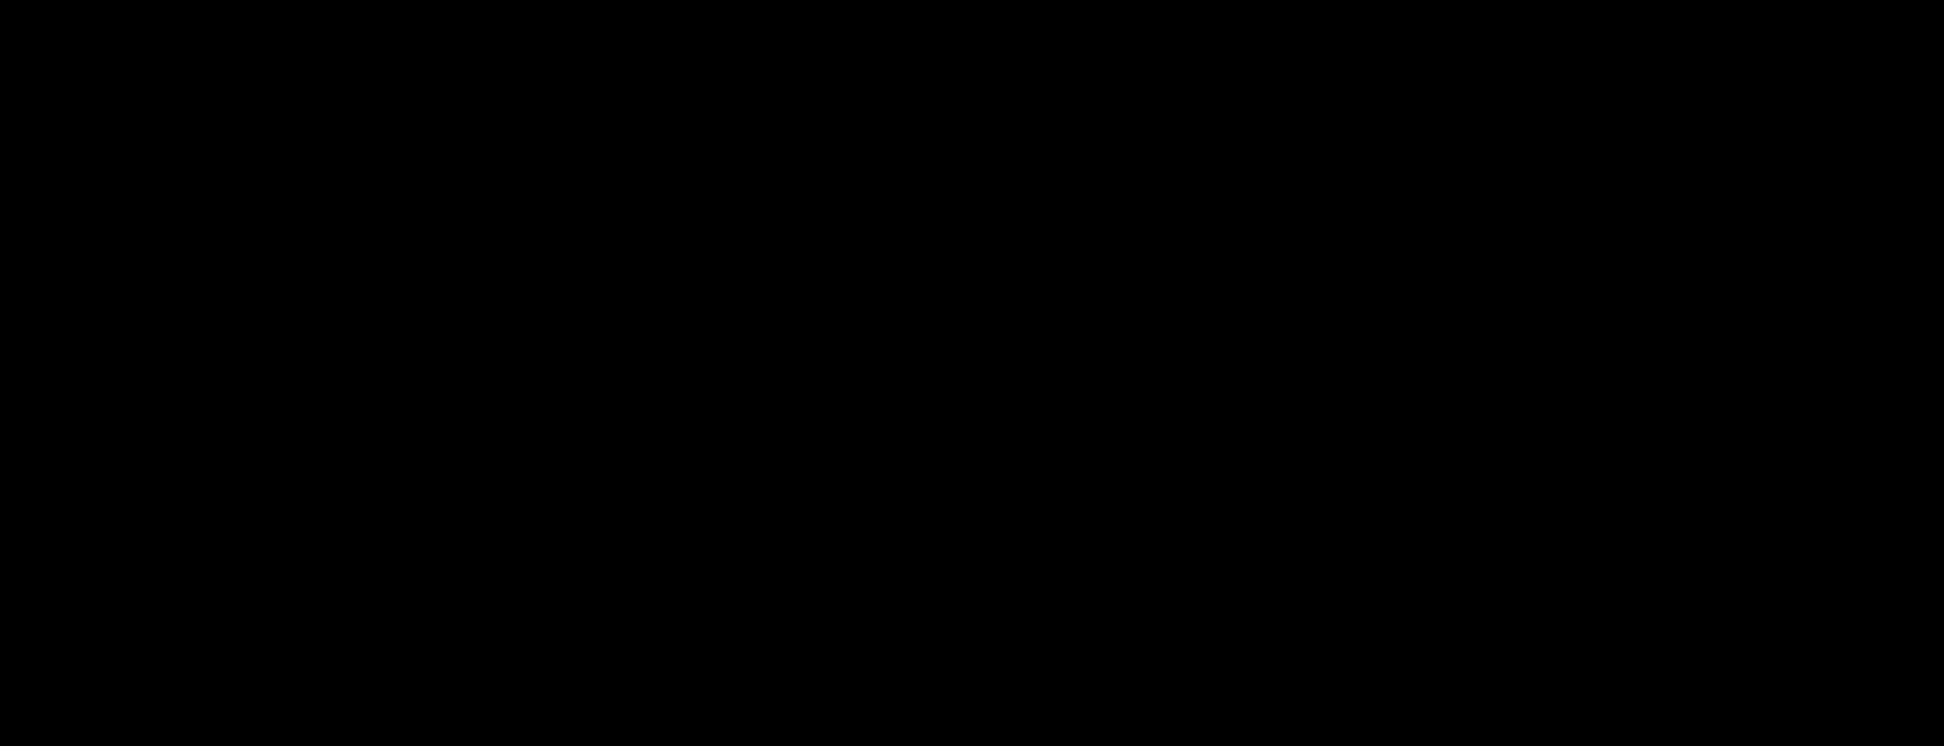 tert-Butyl 5-(7-hydroxycoumarin-4-acetamido)pentyl-d<sub>4</sub> carbamate